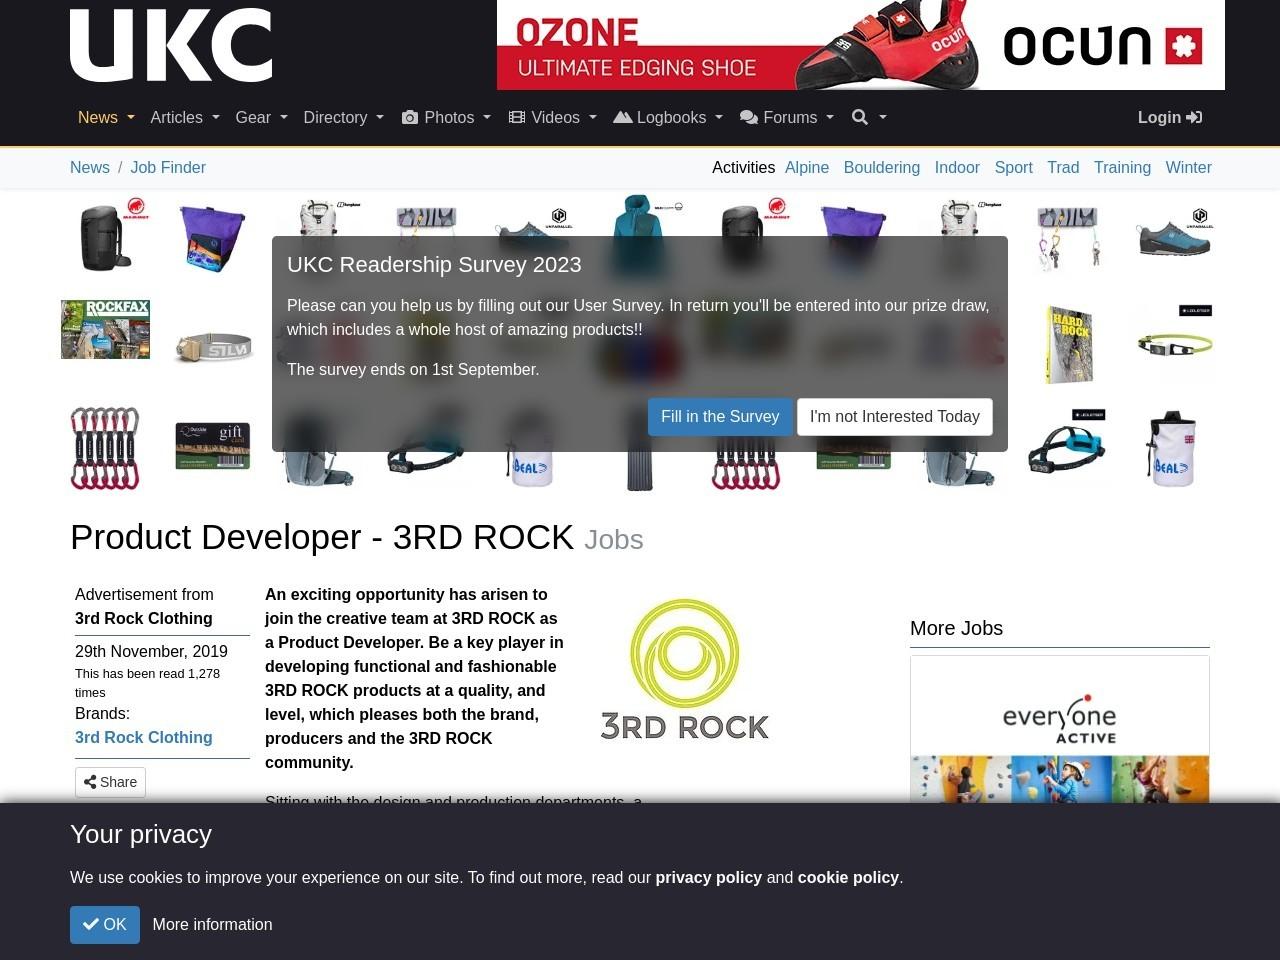 UKC News – JOBS: Product Developer – 3RD ROCK